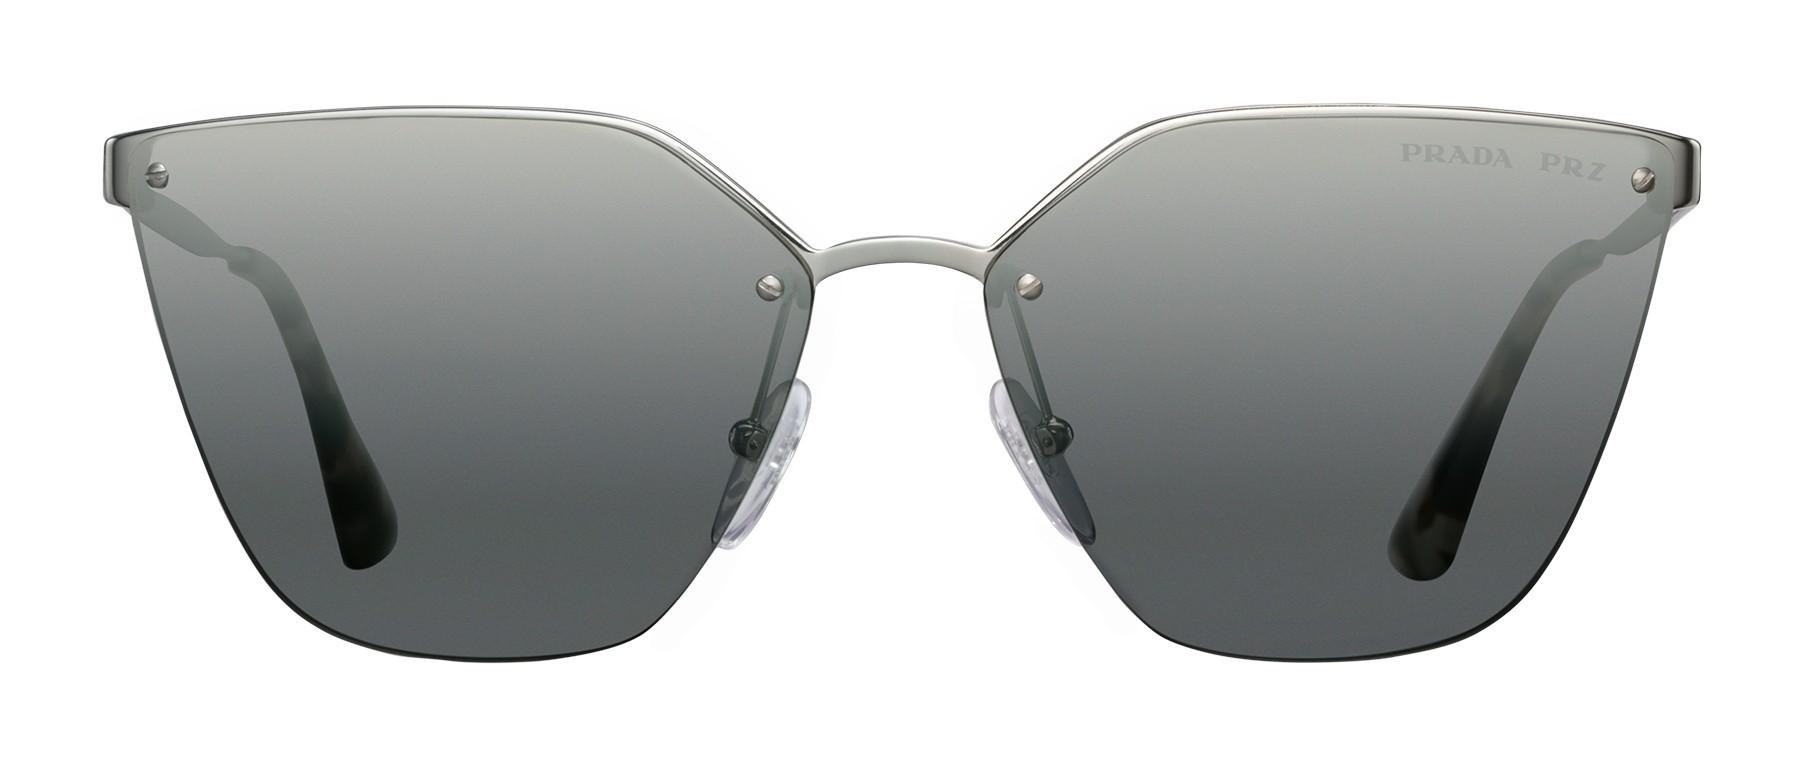 6a9d3f83478 Prada - Prada Cinéma - Dark Steel Irregular Cat Eye Sunglasses - Prada  Cinéma Collection - Sunglasses - Prada Eyewear